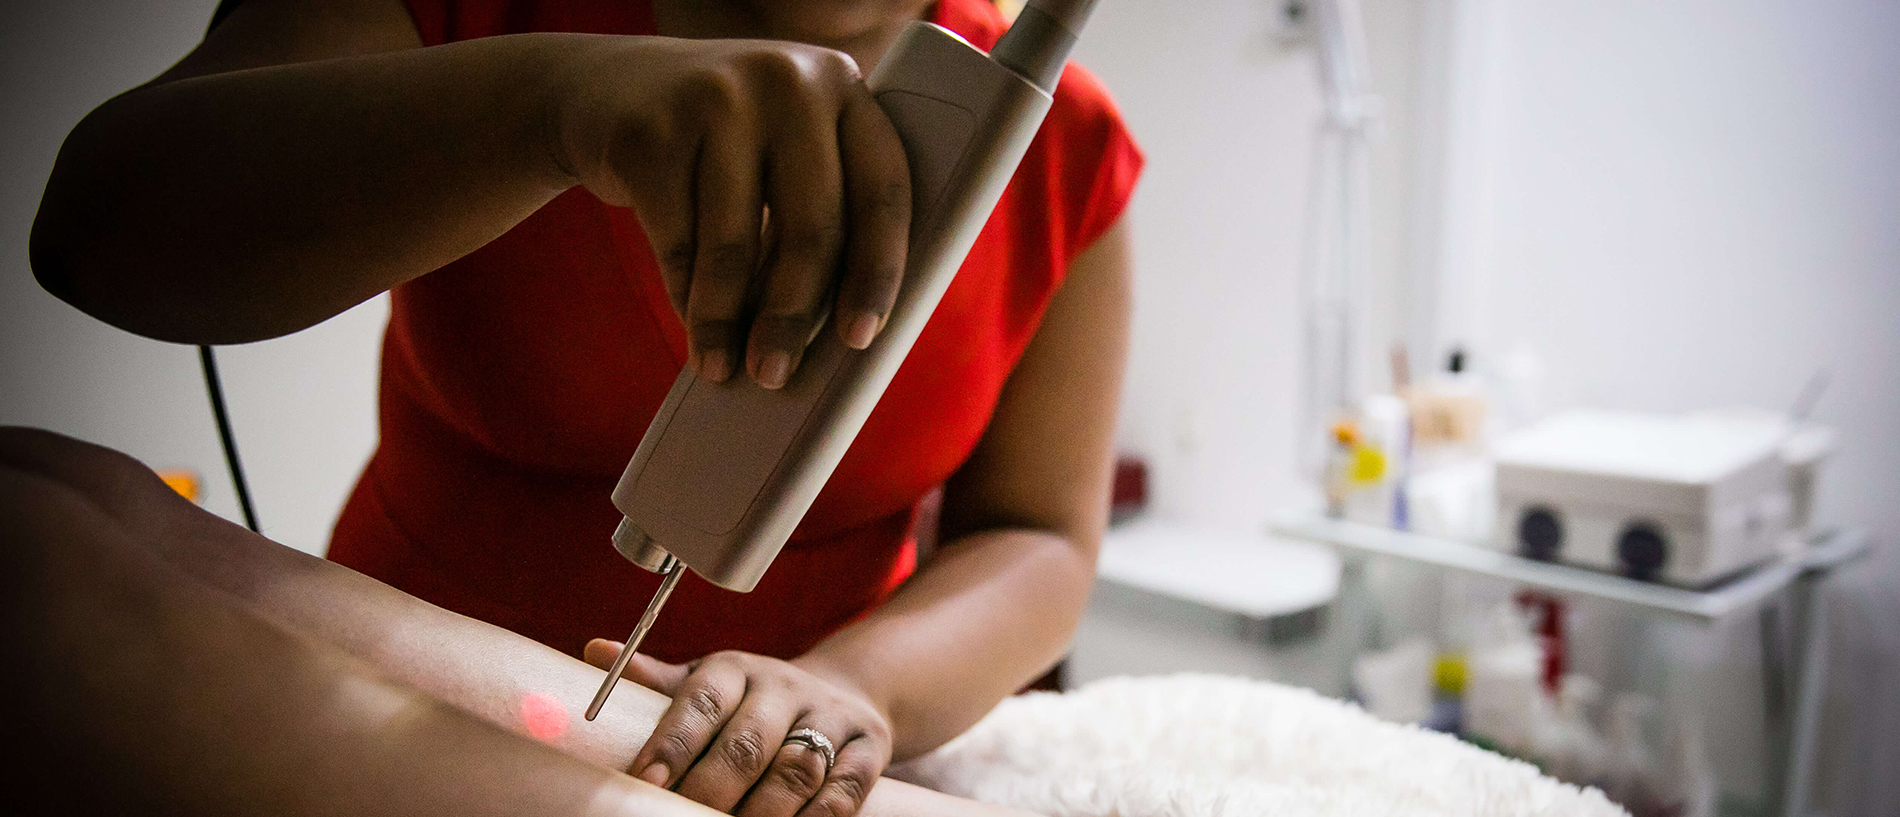 Laser Hair Removal | True Beauty Aesthetics